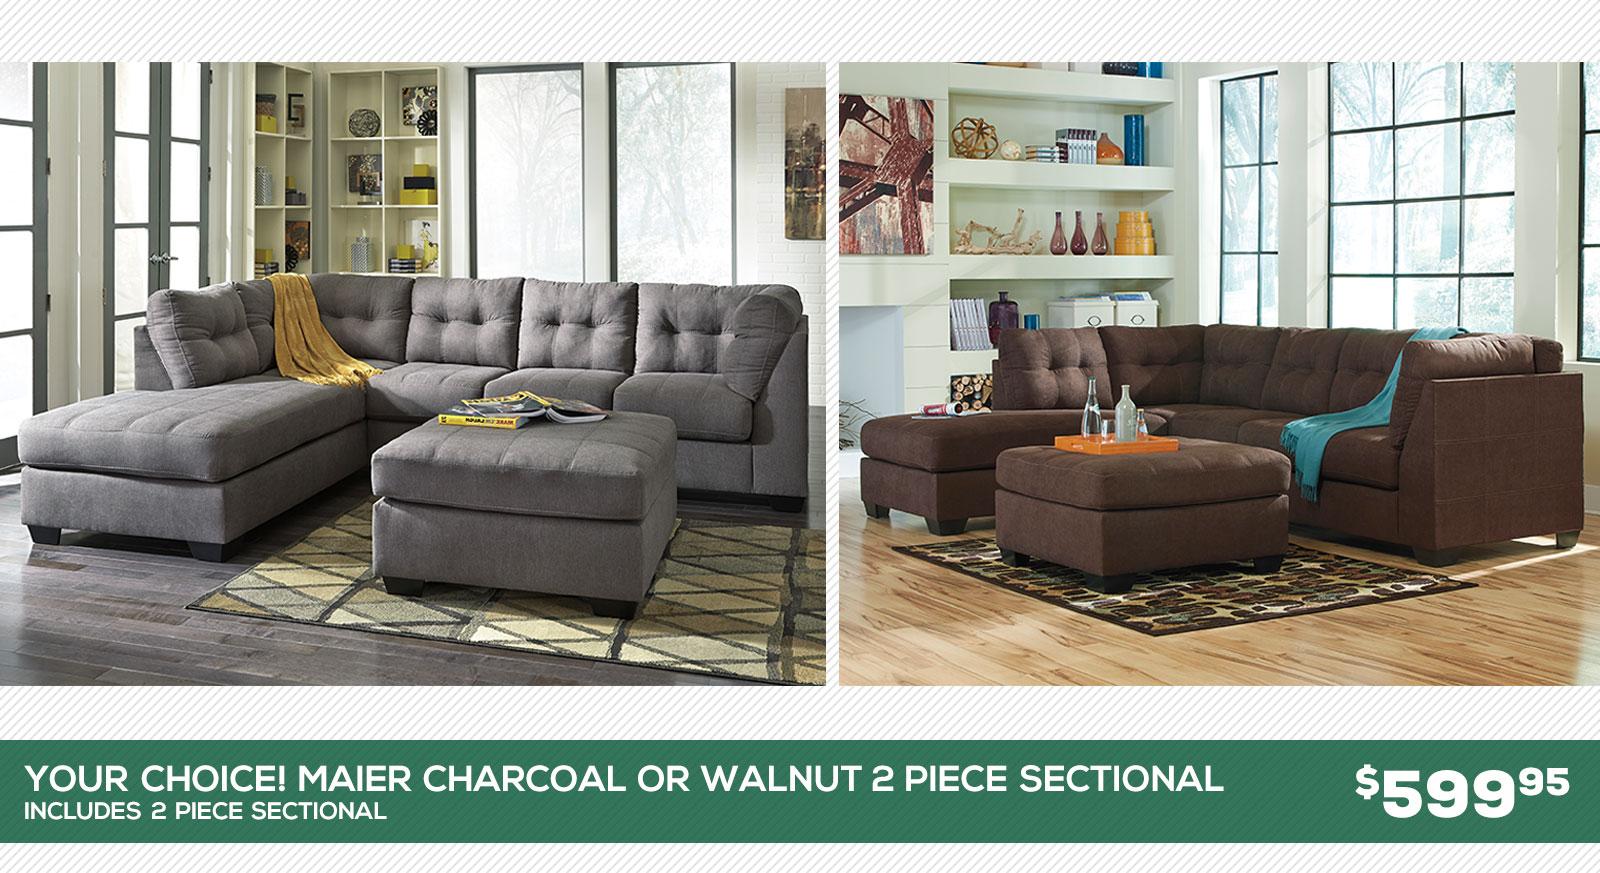 Superbe Furniture, Appliances, Electronics, Mattresses In Longview, Tyler And  Marshall TX | Adams Furniture U0026 Appliance